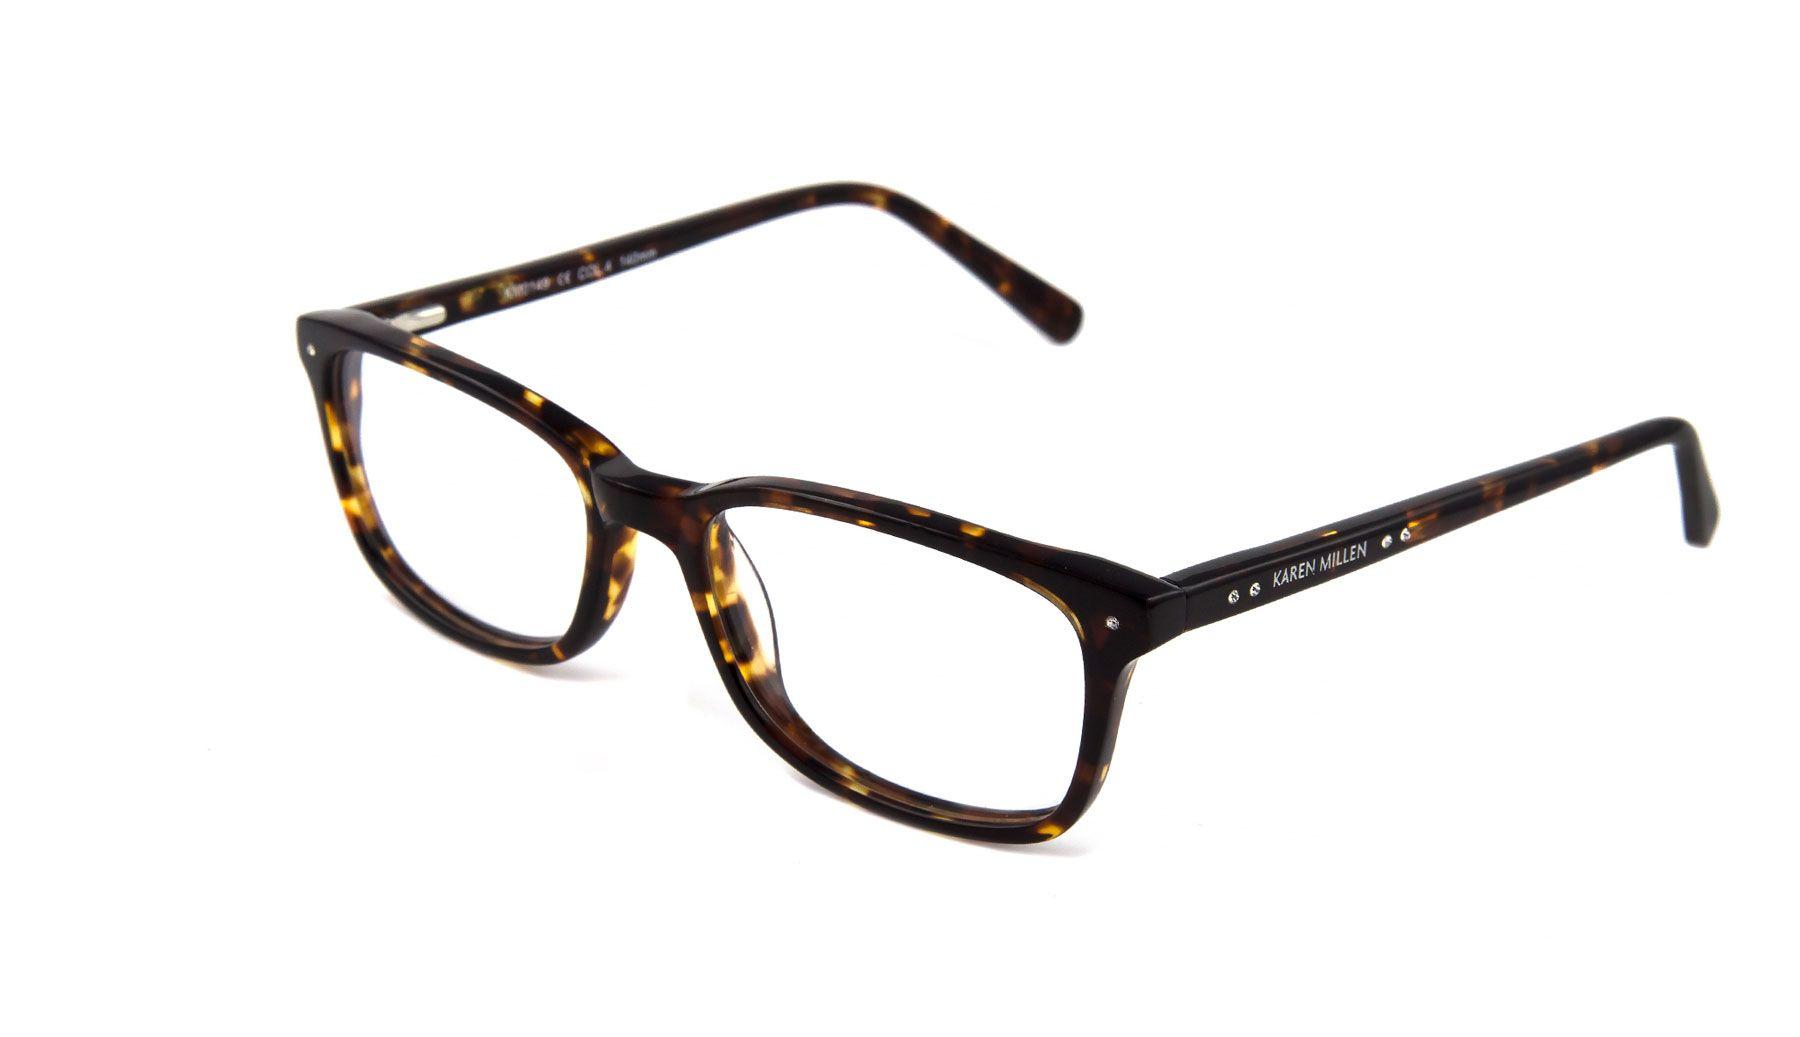 847f9126a5 Karen Millen Tortoiseshell Glasses